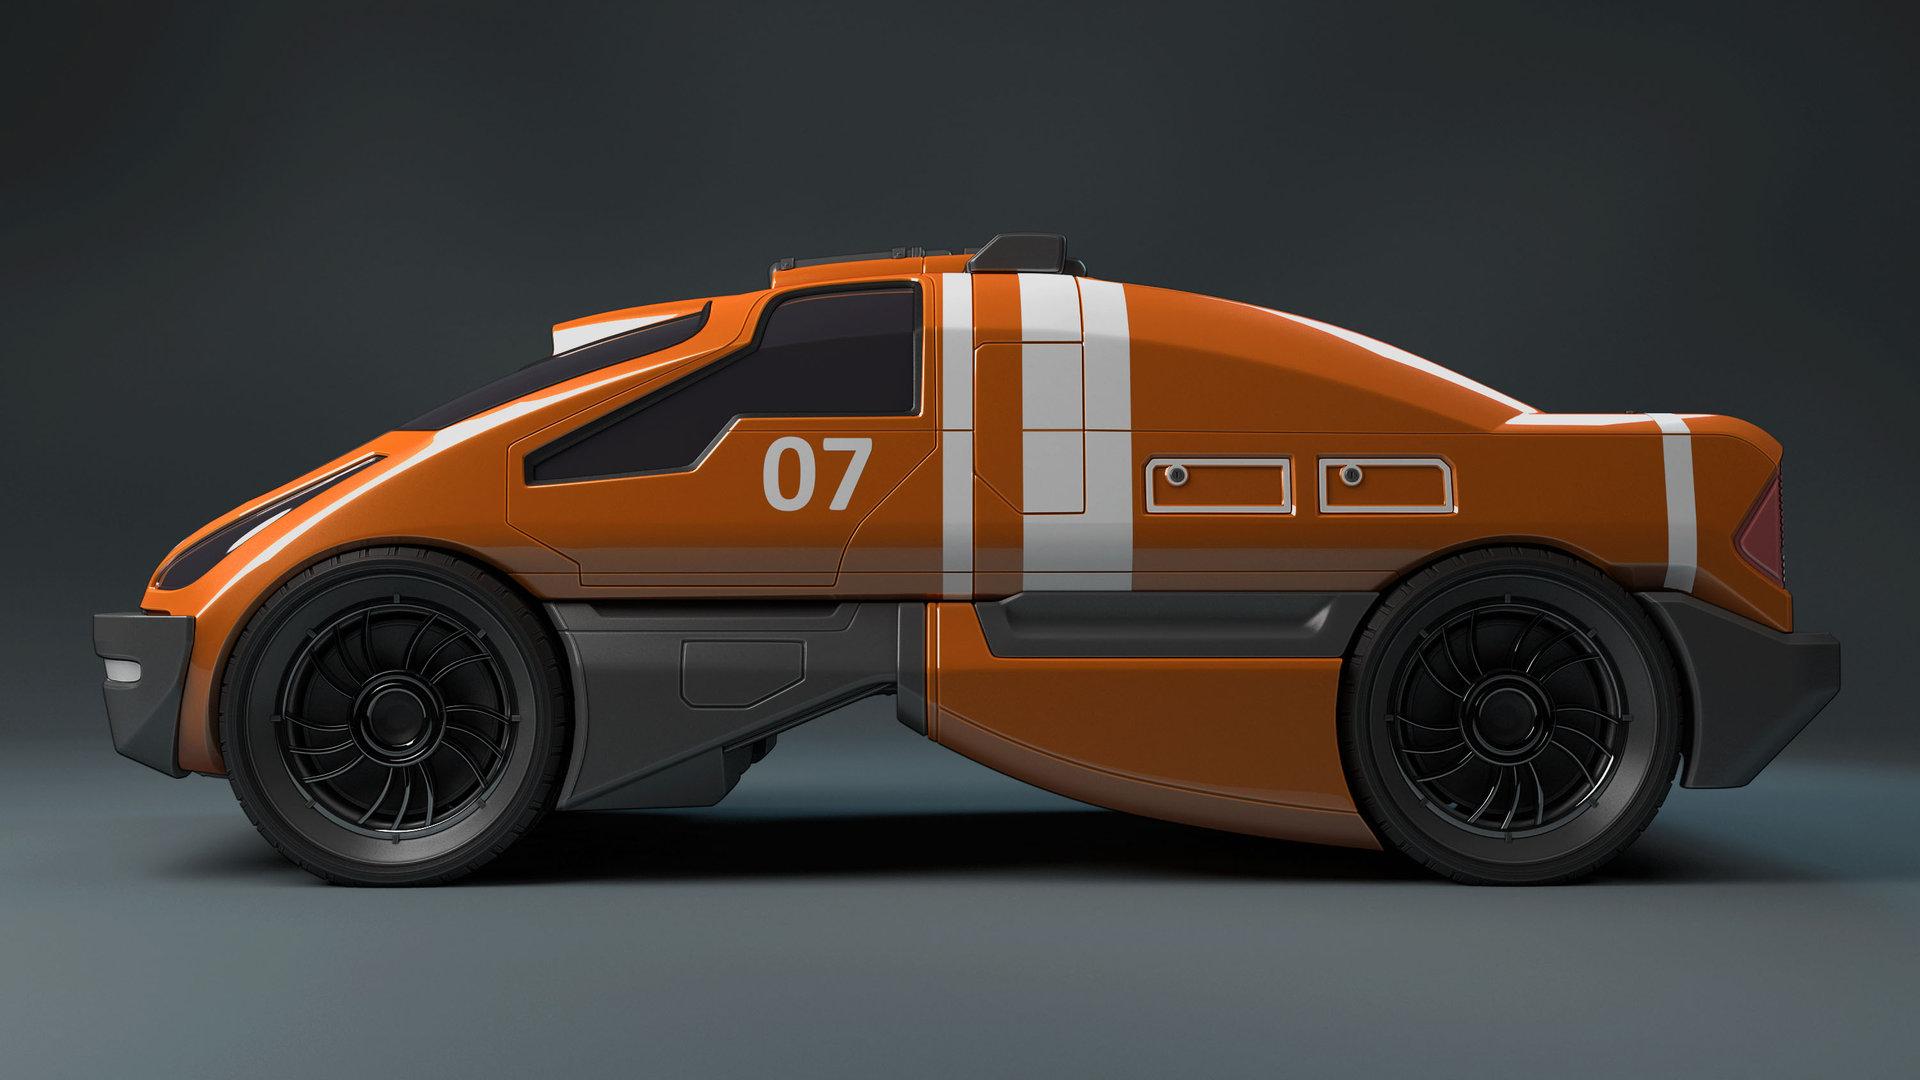 Mark van haitsma concept car side